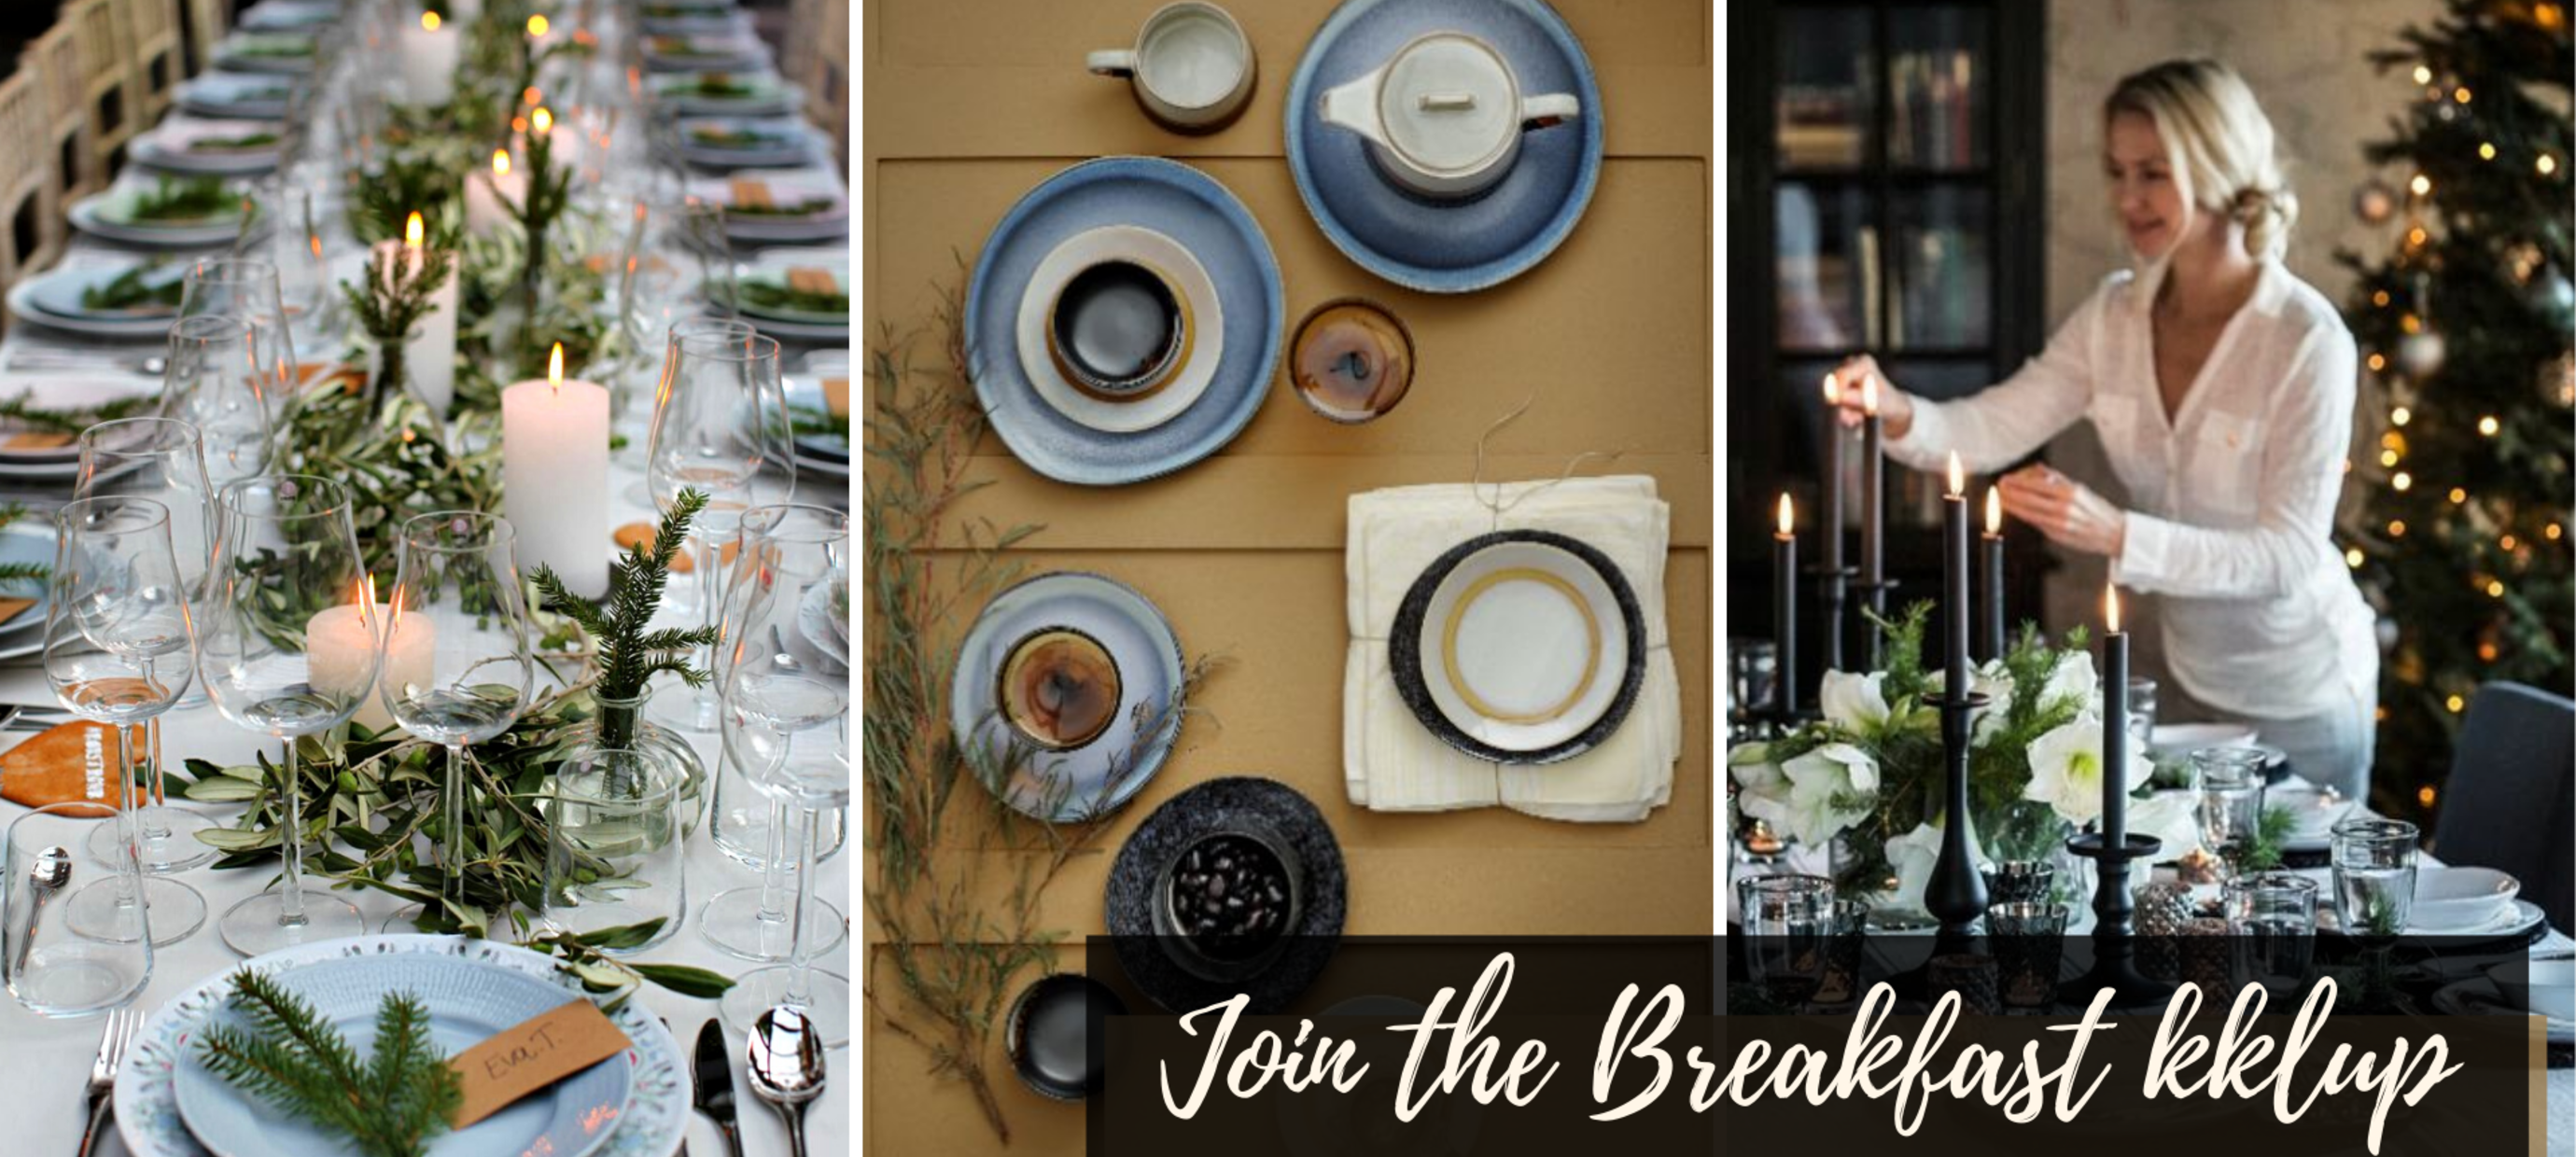 UITVERKOCHT The Breakfast kklup zondag 15 december